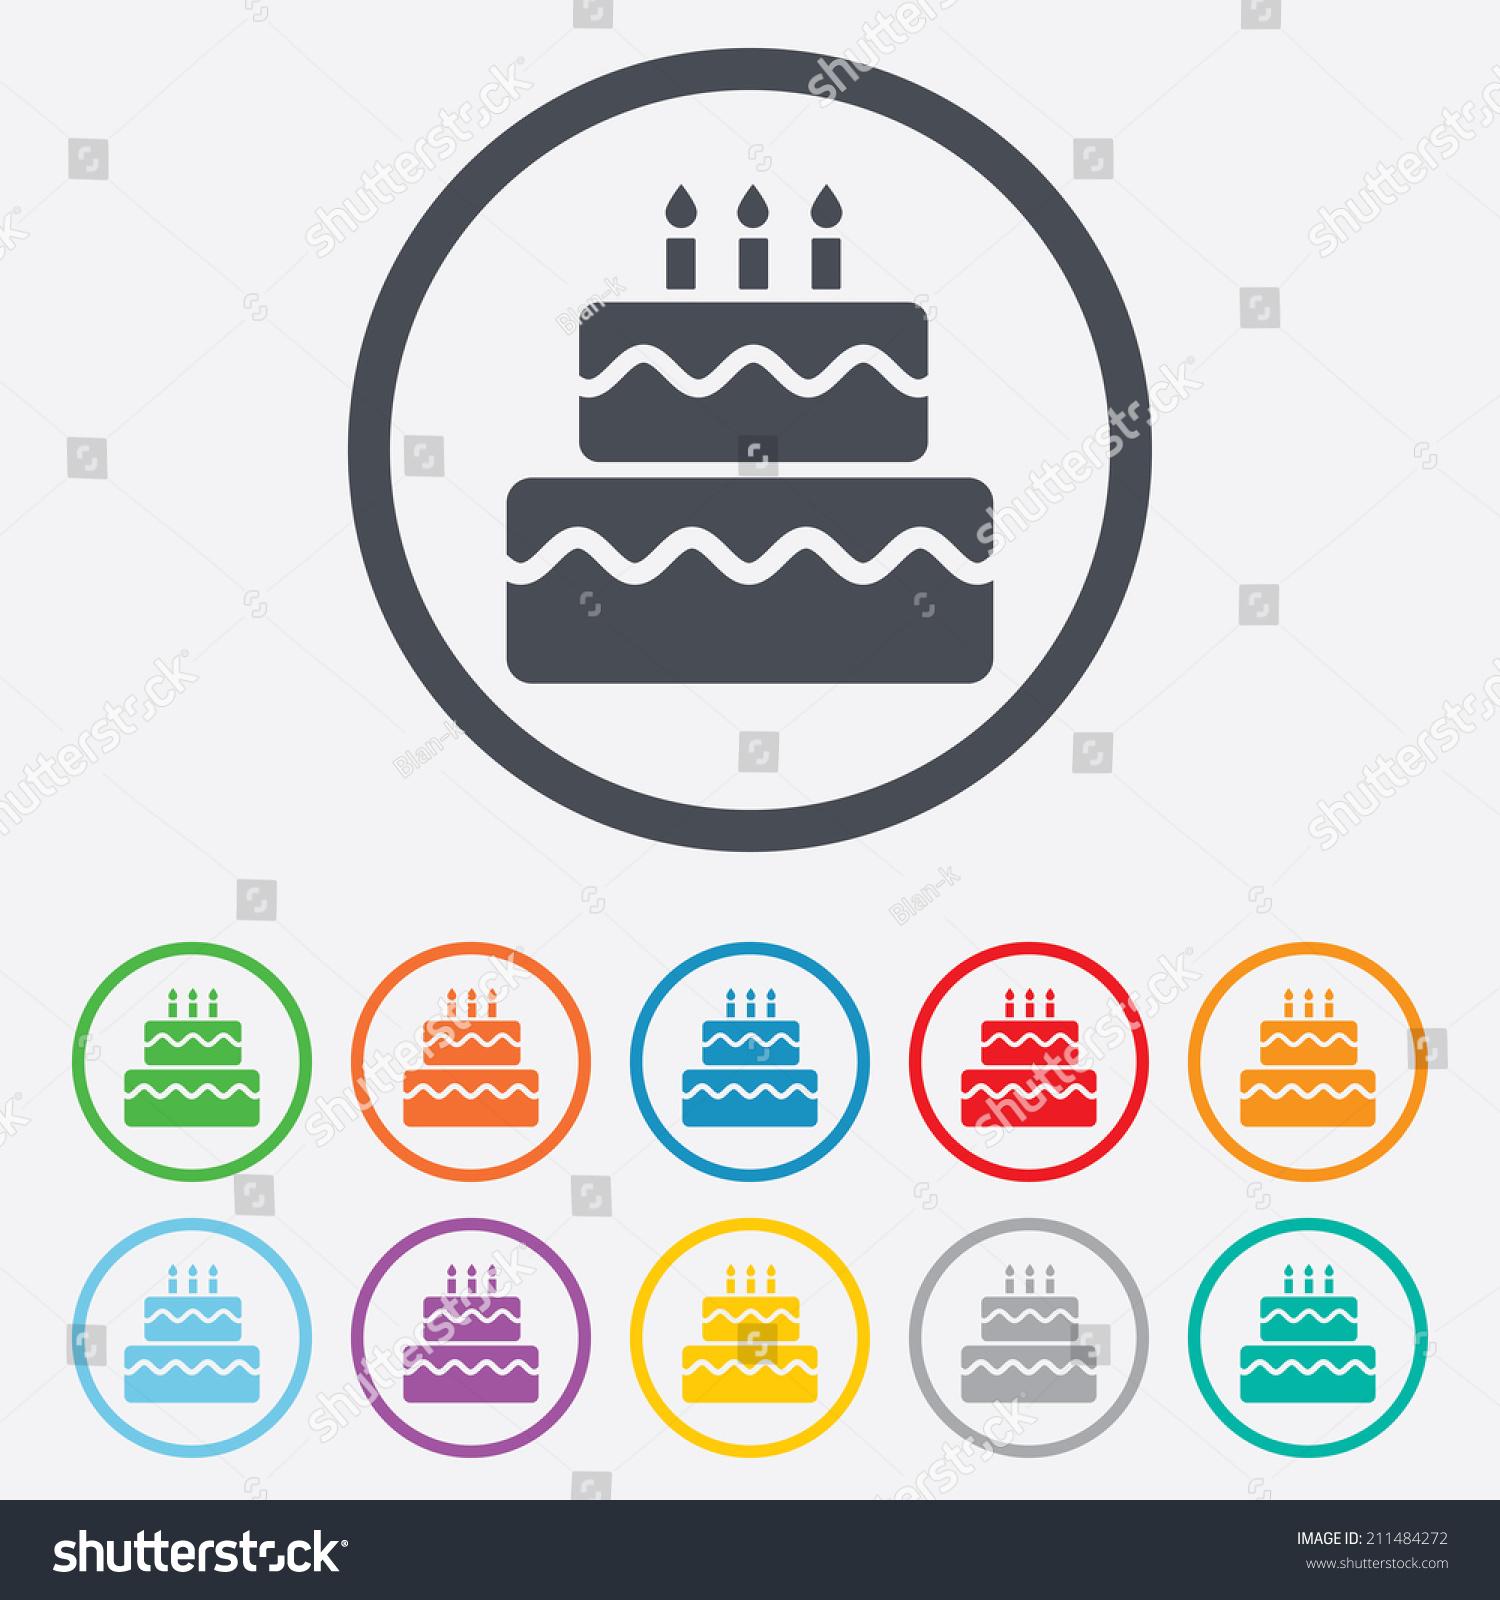 Birthday Cake Sign Icon Cake Burning Stock Vector HD Royalty Free